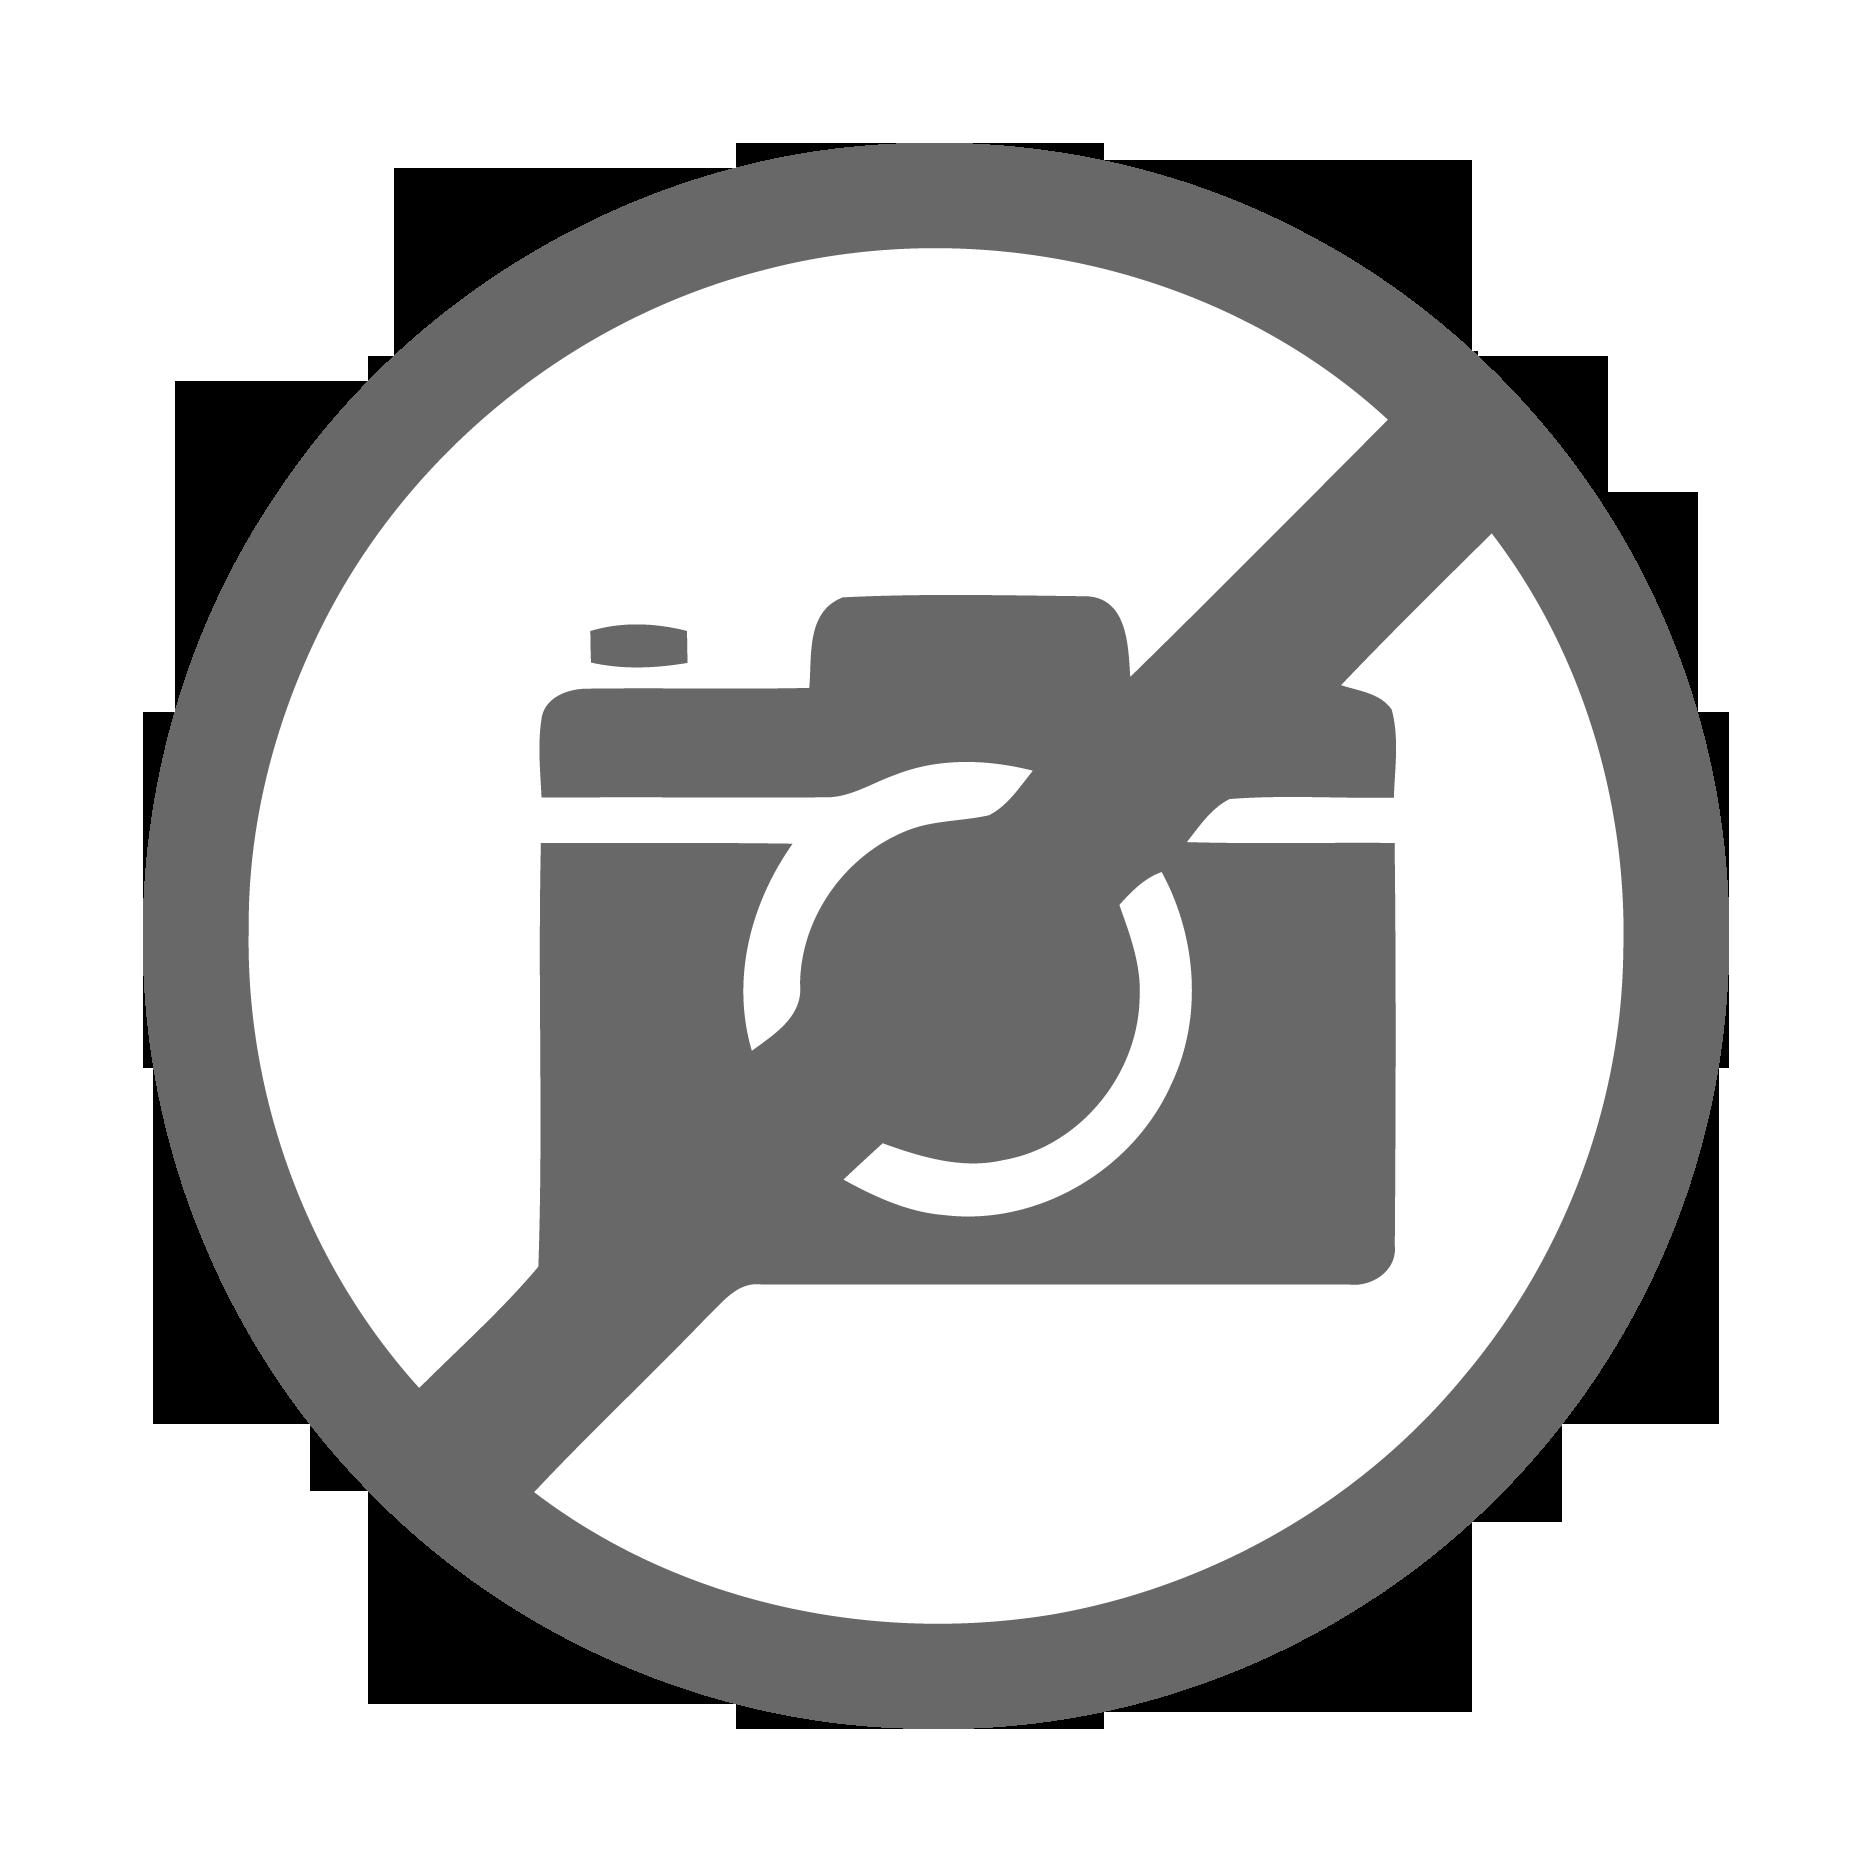 Mekica & Cafe